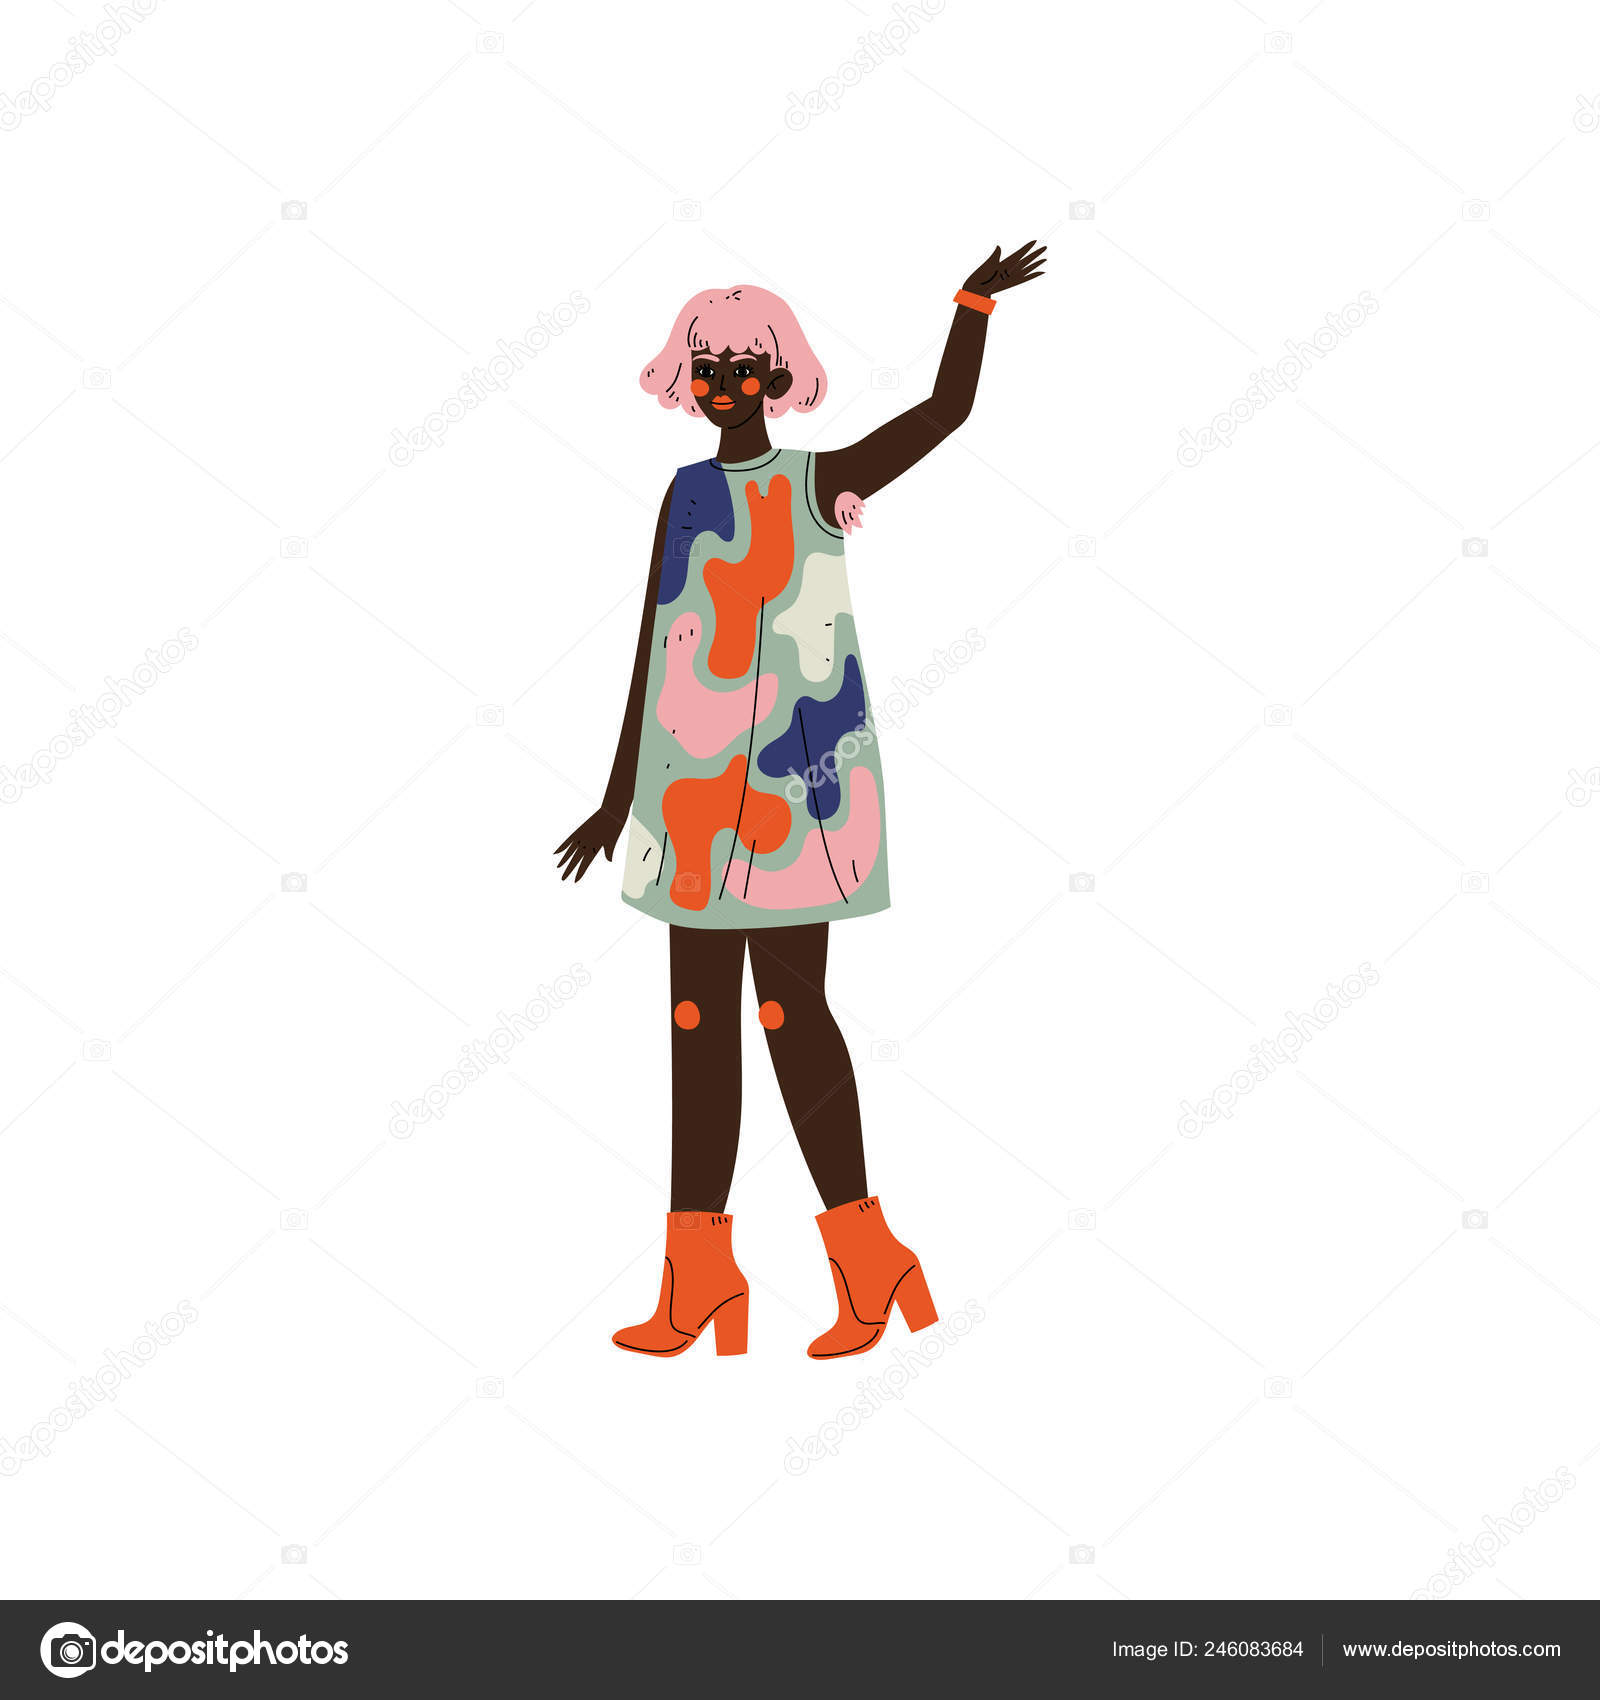 Chlupatý Afričan